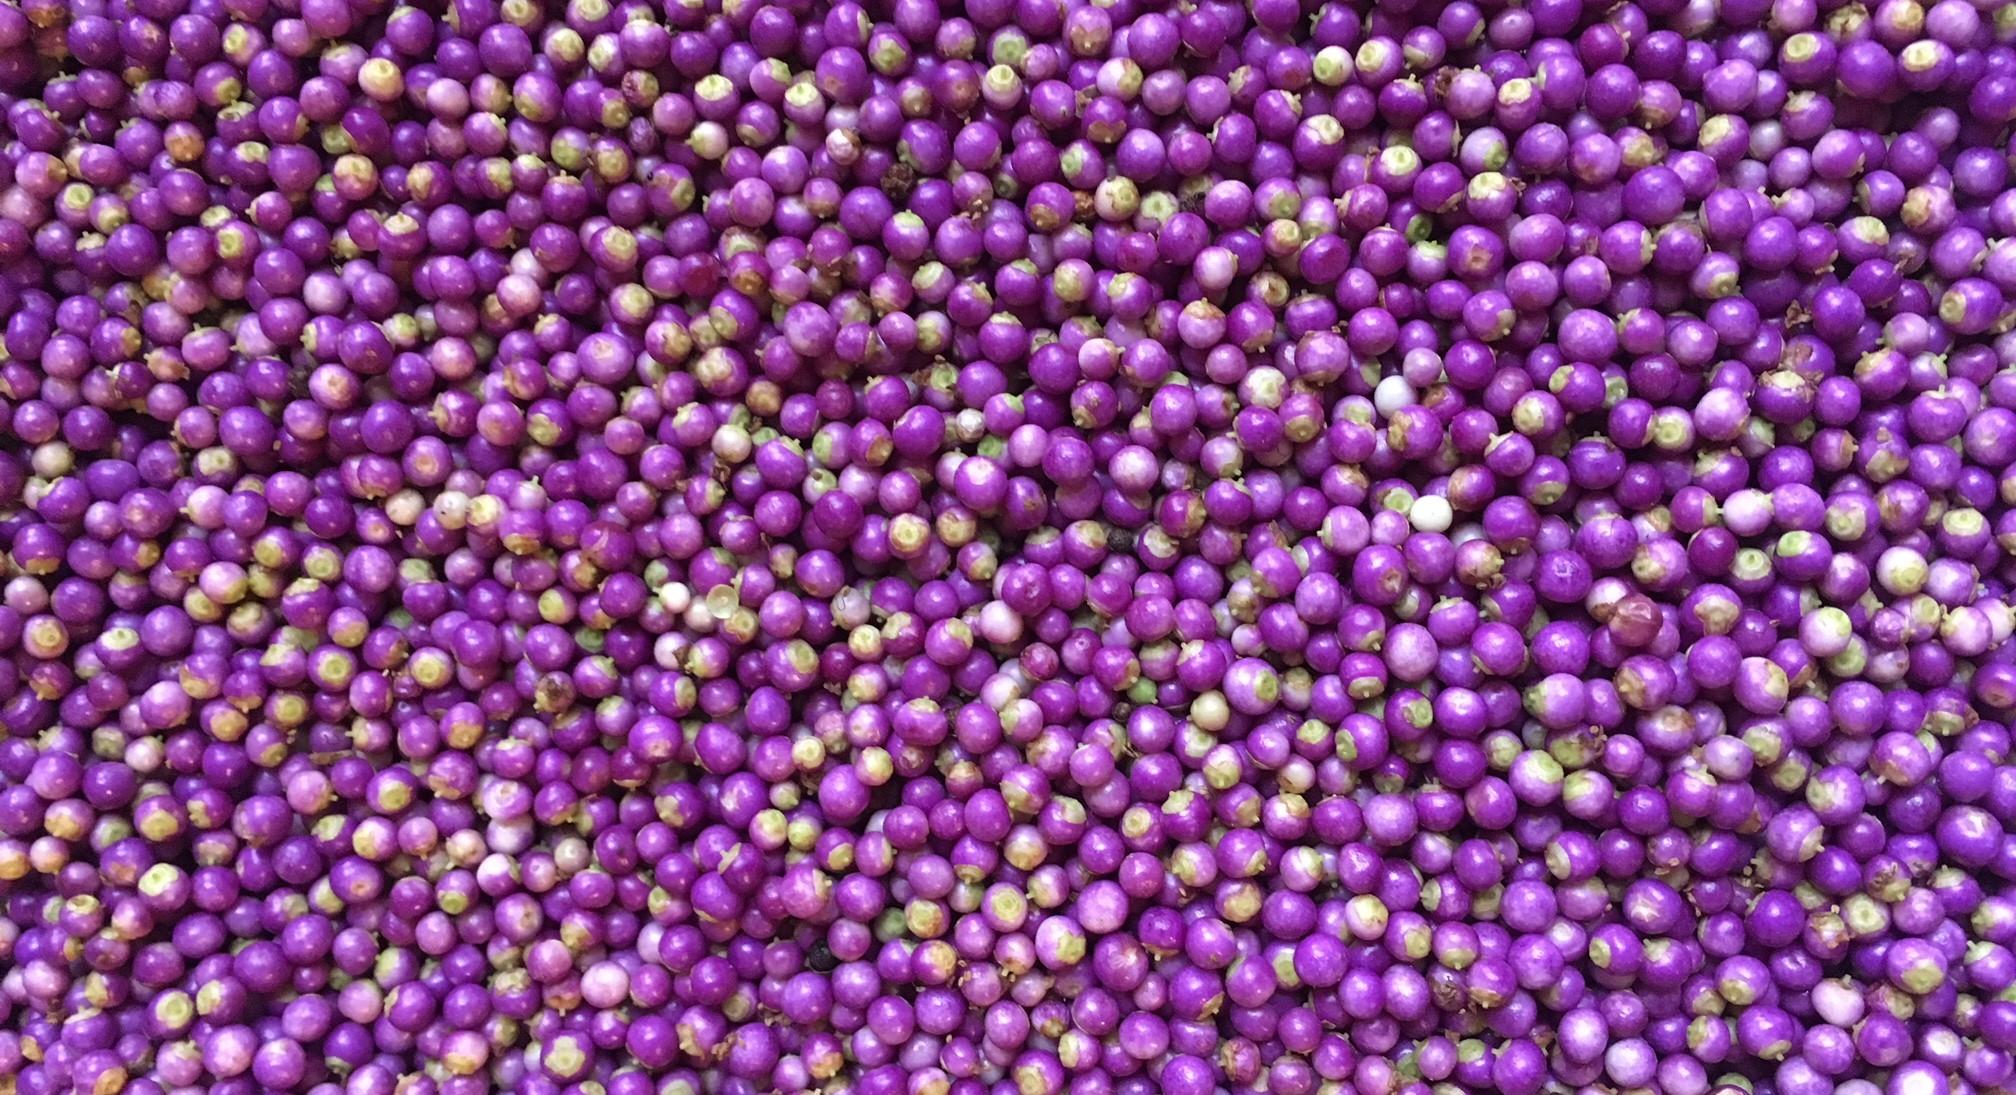 hundreds of freshly-picked purple beautyberries